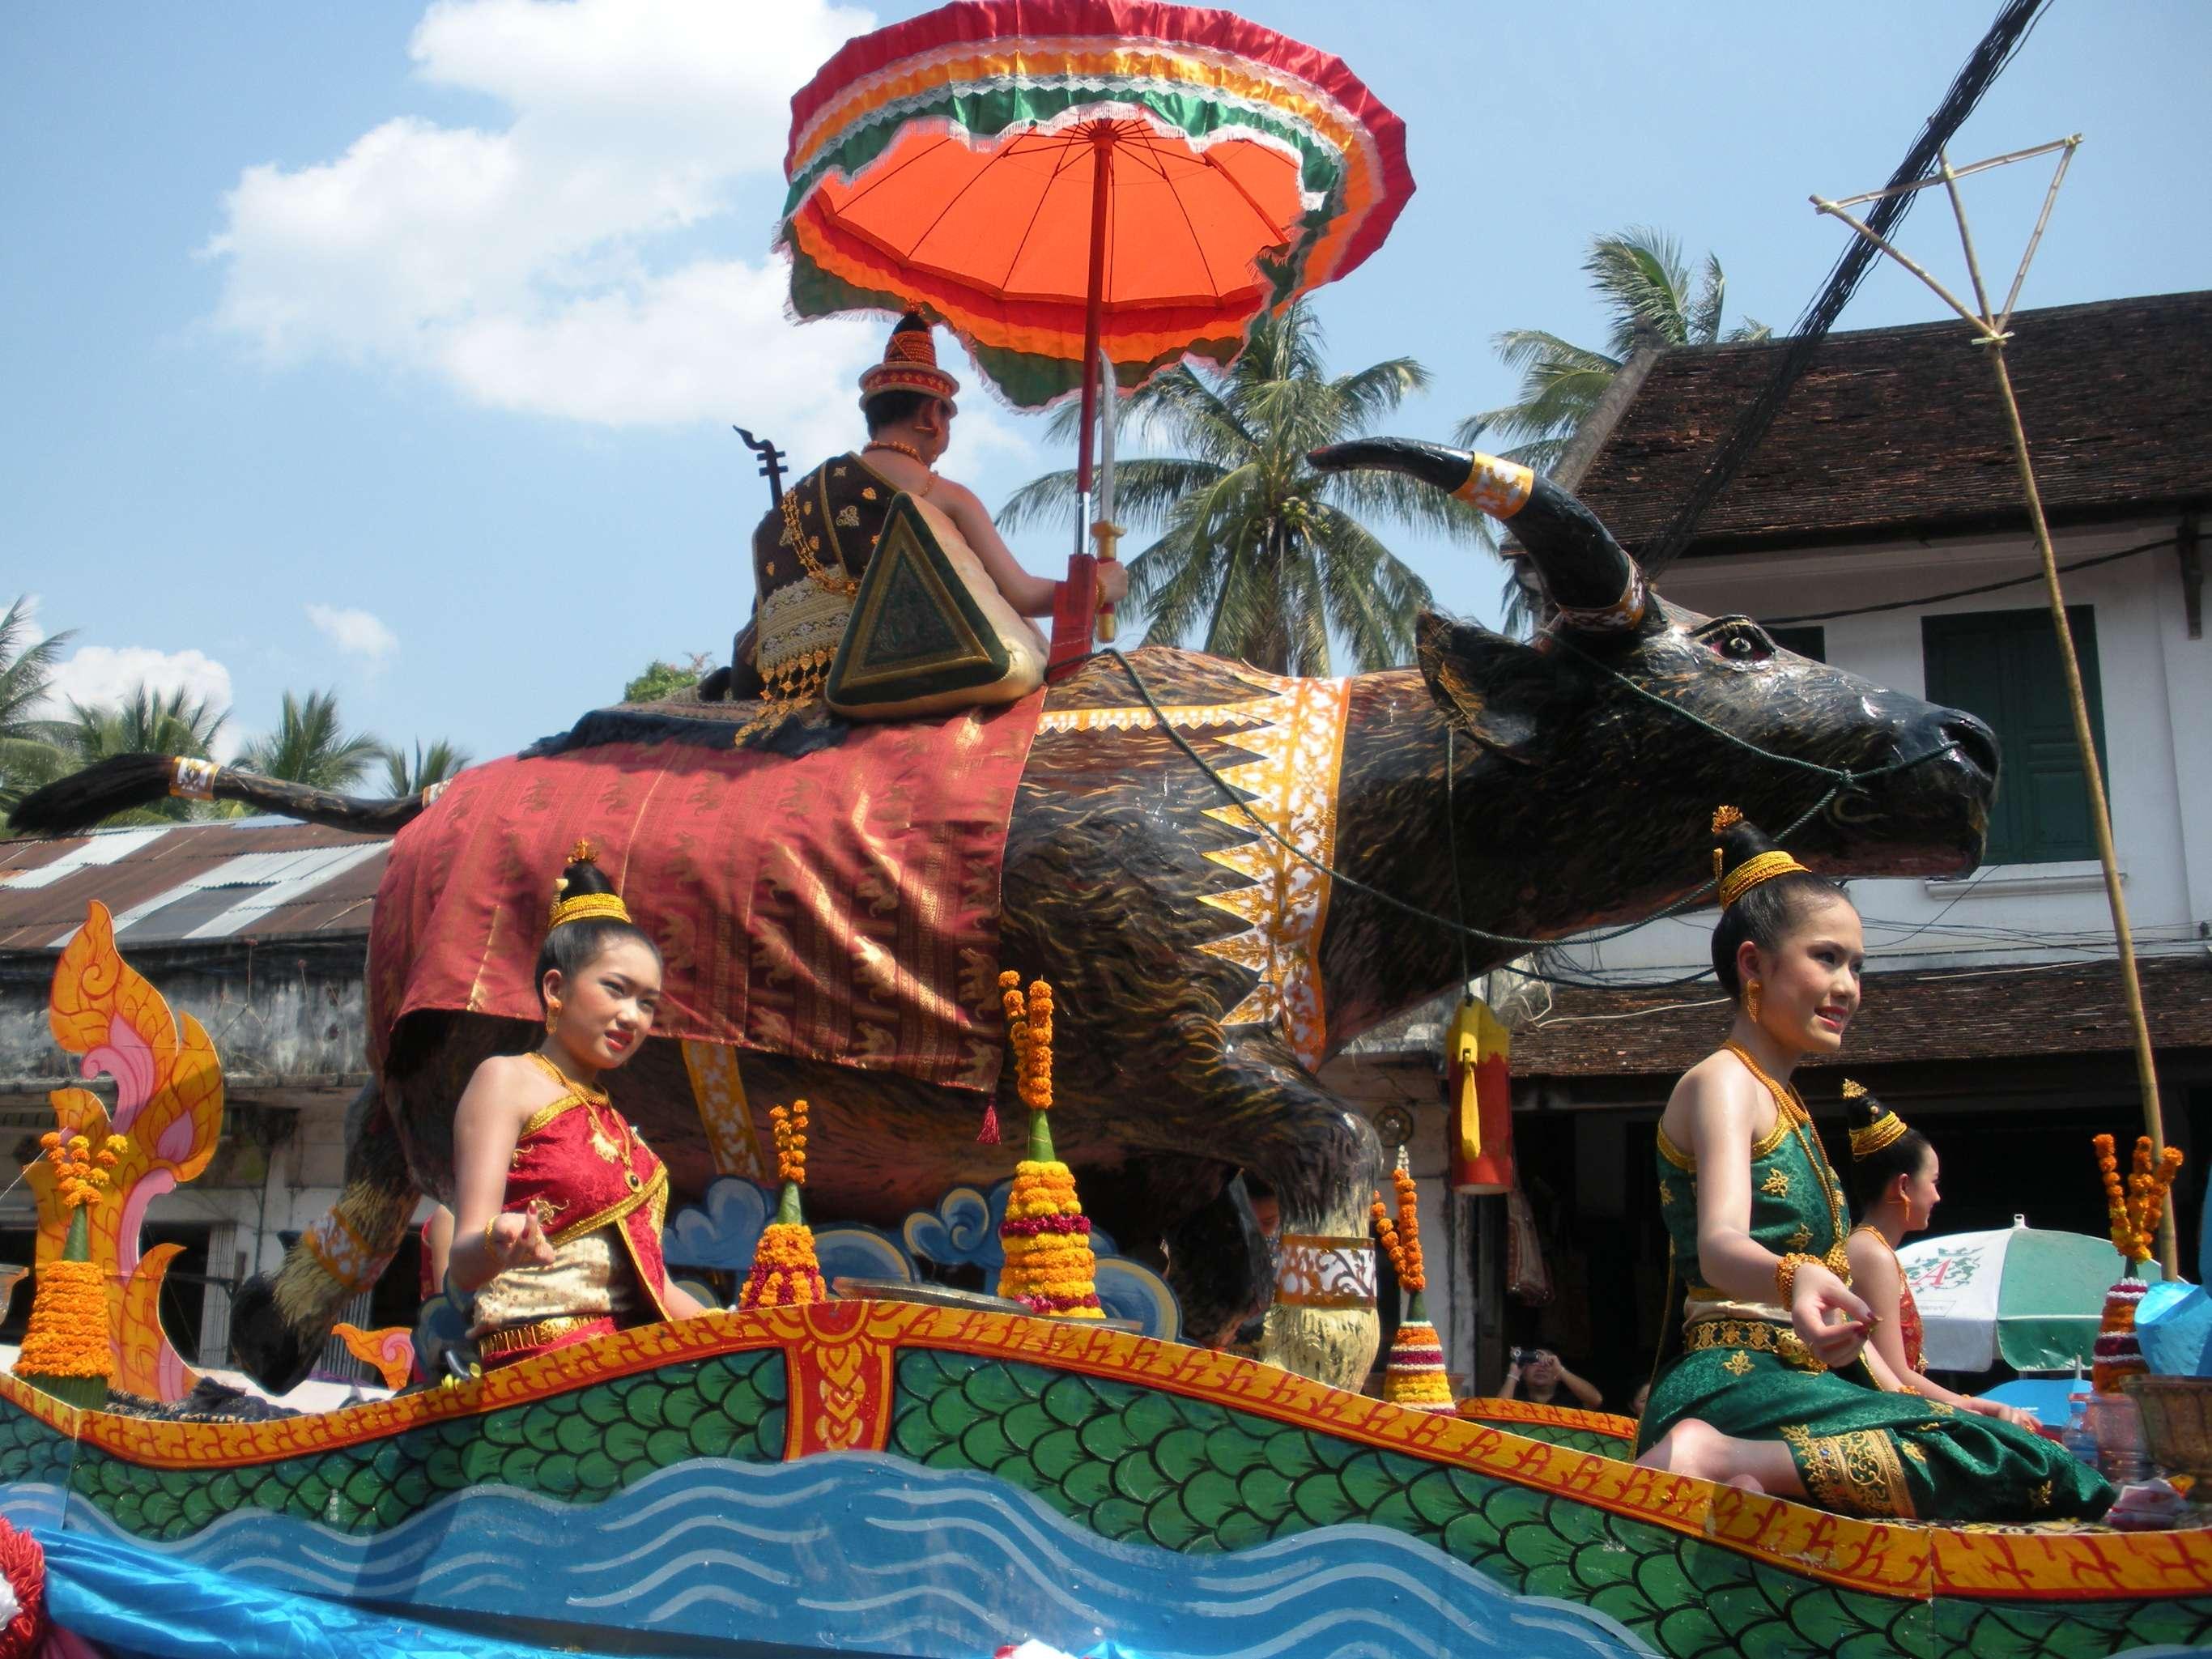 7-Day Northern Thailand Tour to Luang Prabang - Laos and Thailand Itinerary